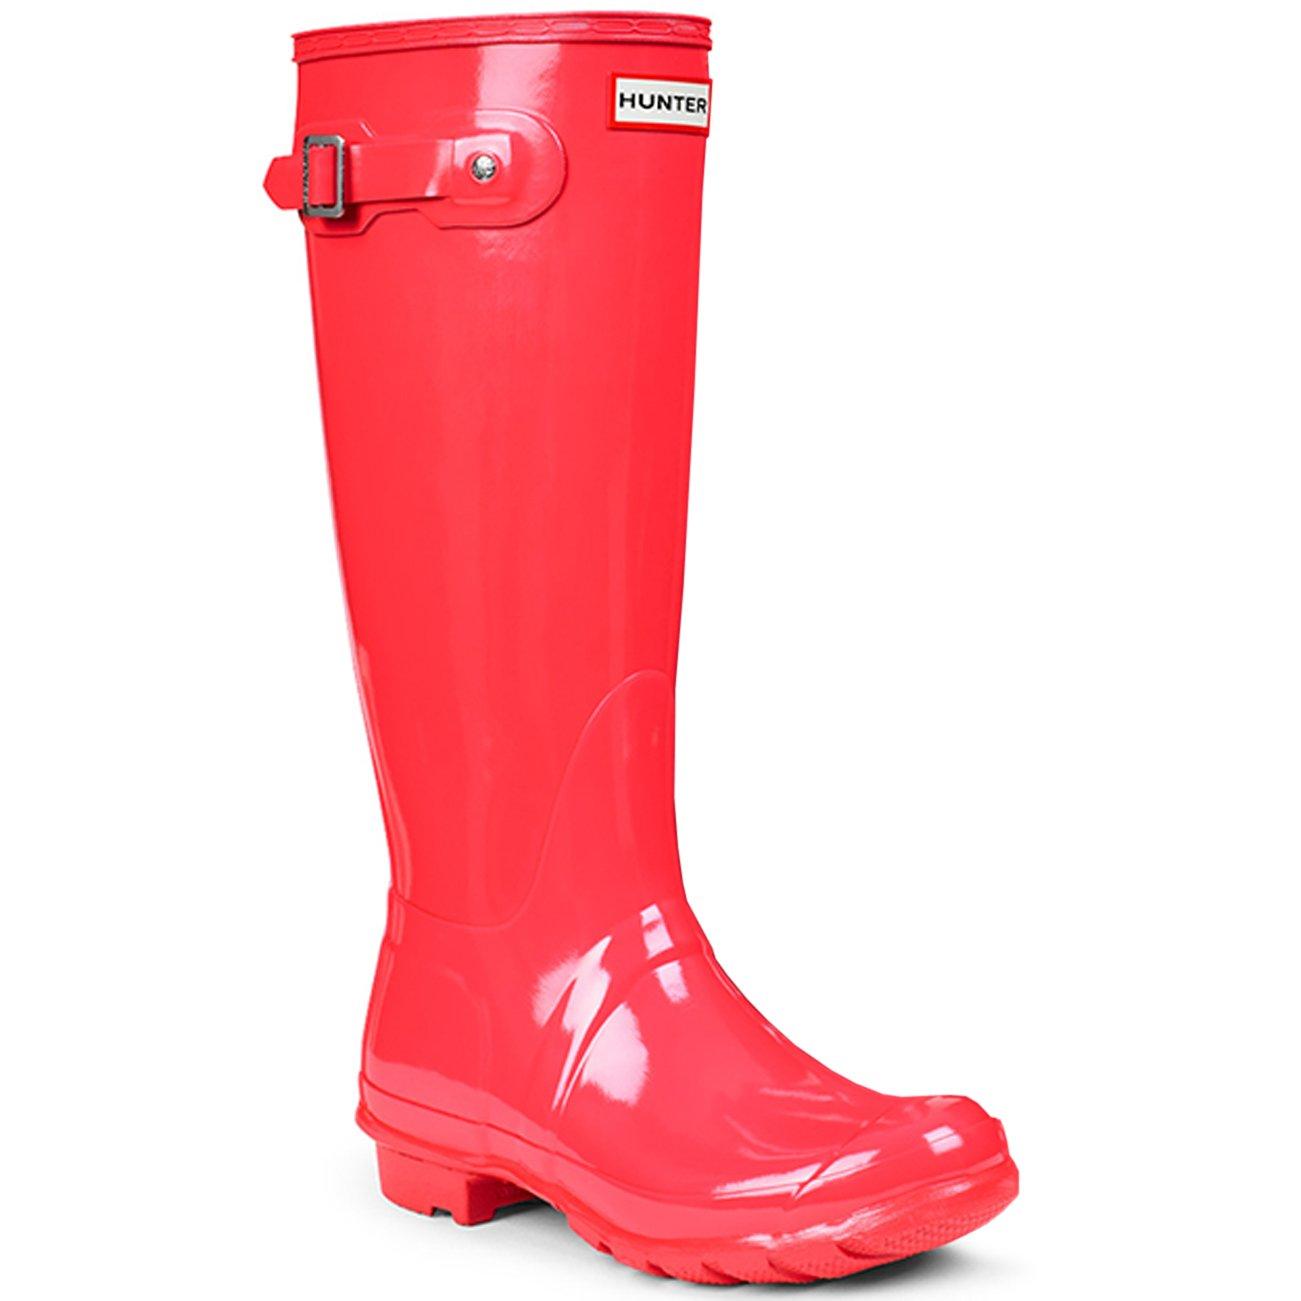 Womens Hunter Original Tall Gloss Waterproof Wellington Winter Rain Boot B00NGPQN2U 5 M US|Bright Coral